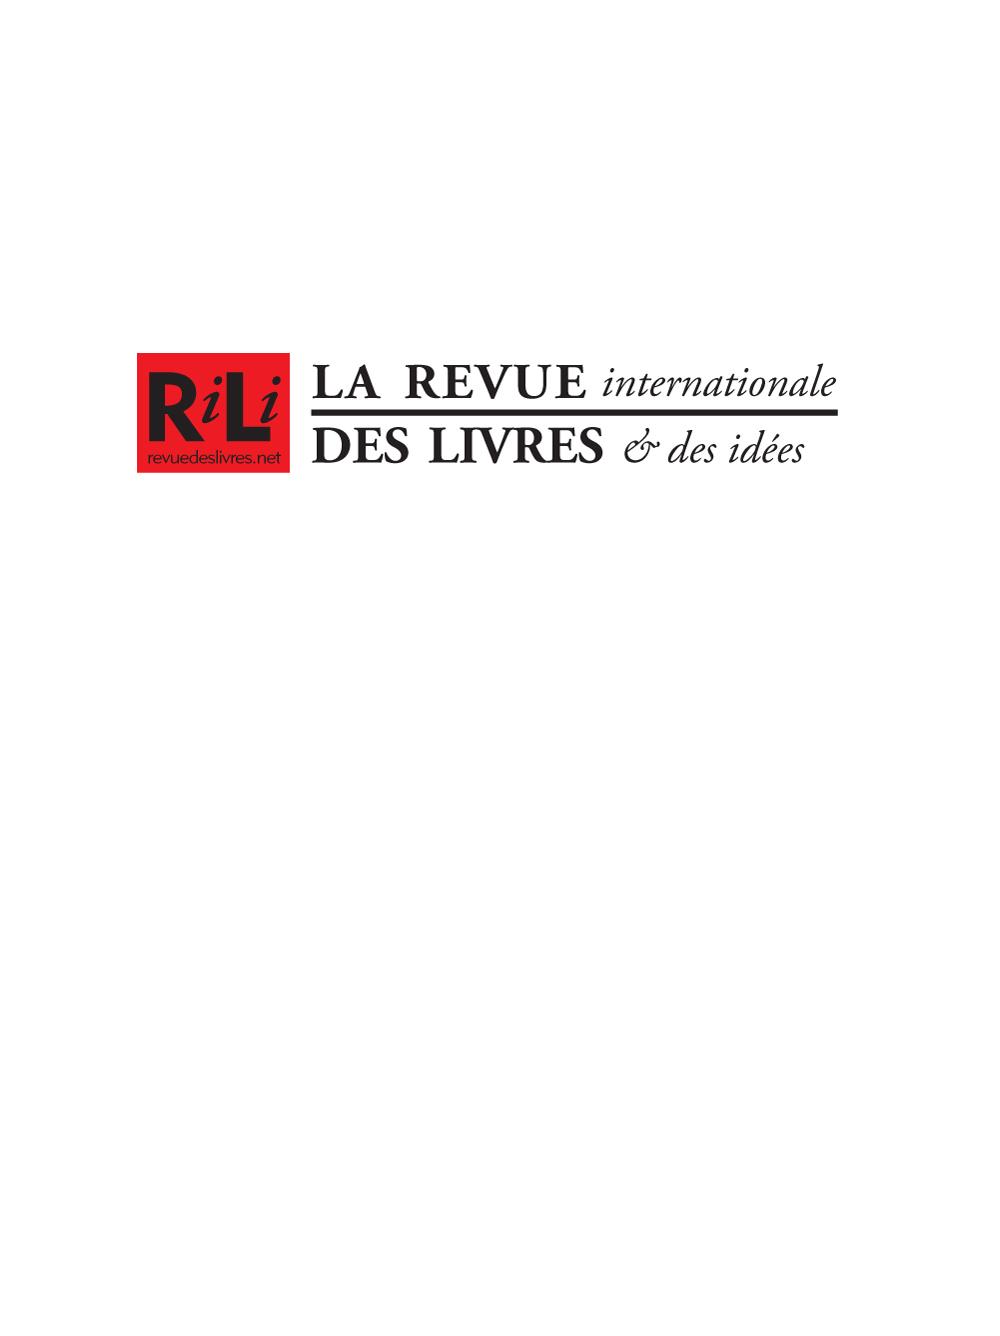 revue internationale des livres logo